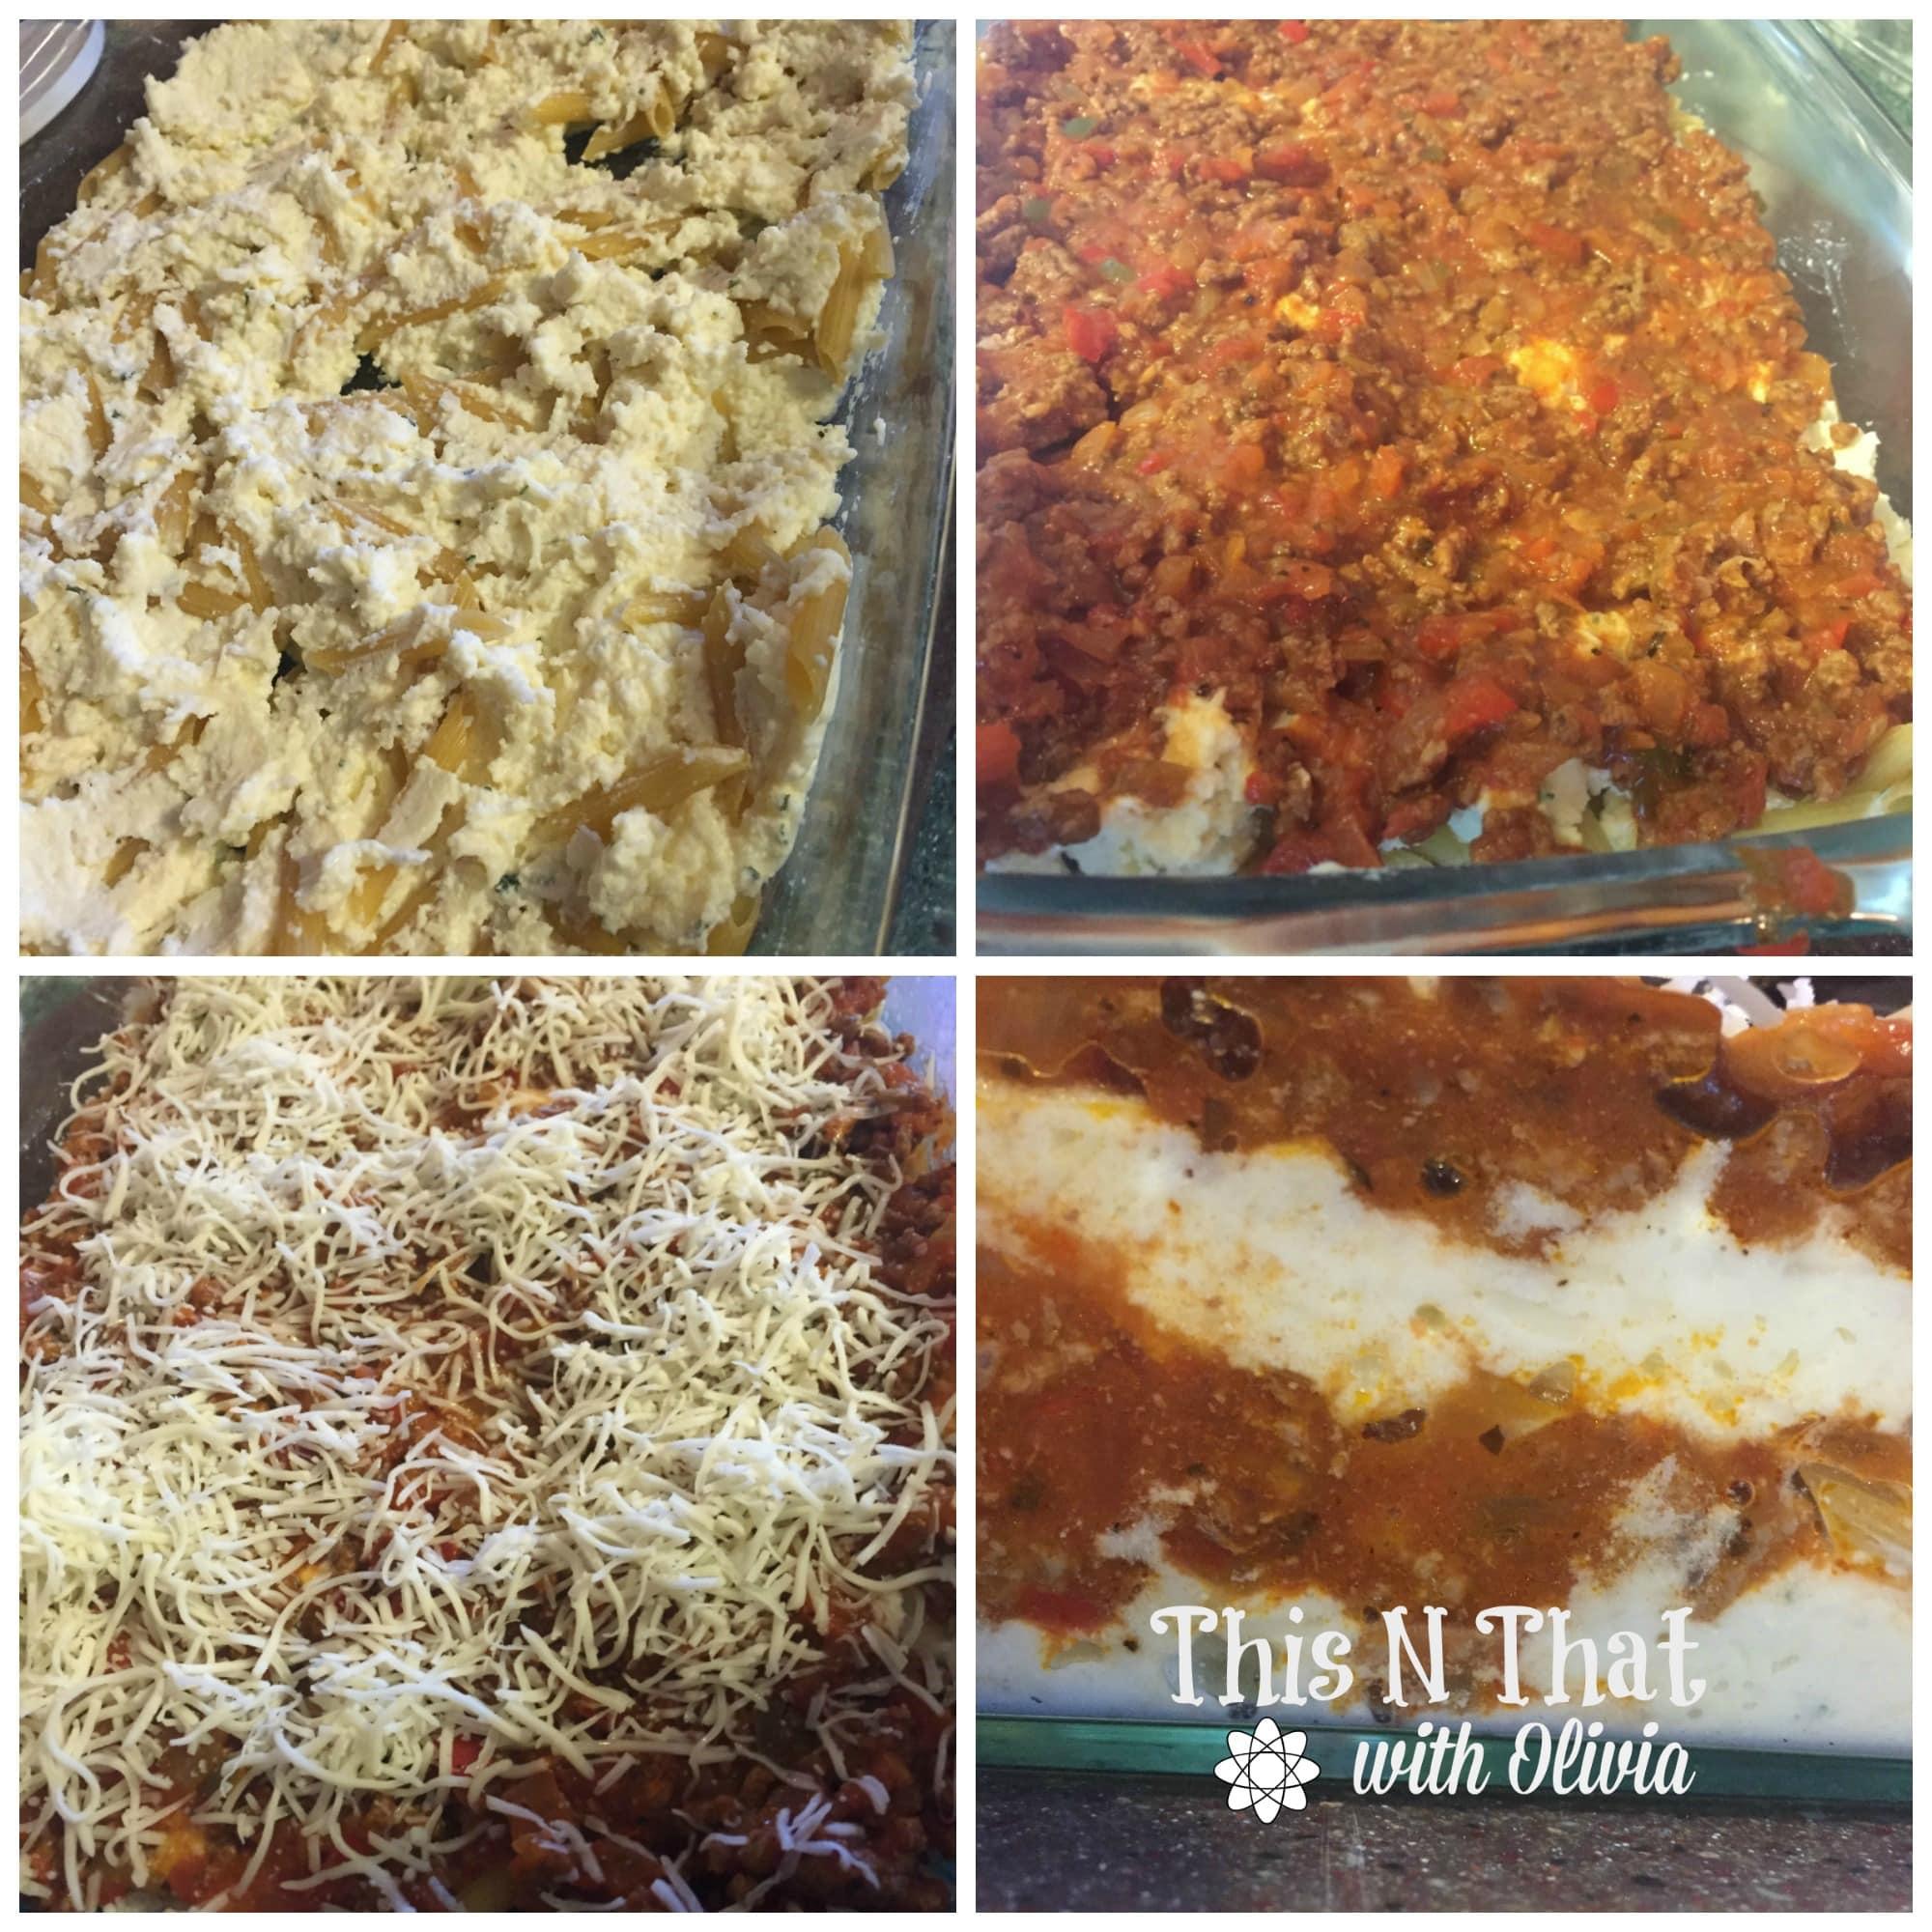 Baked Ziti with Prego® Farmers' Market Sauces #PickedAtPeak #ad   ThisNThatwithOlivia.com